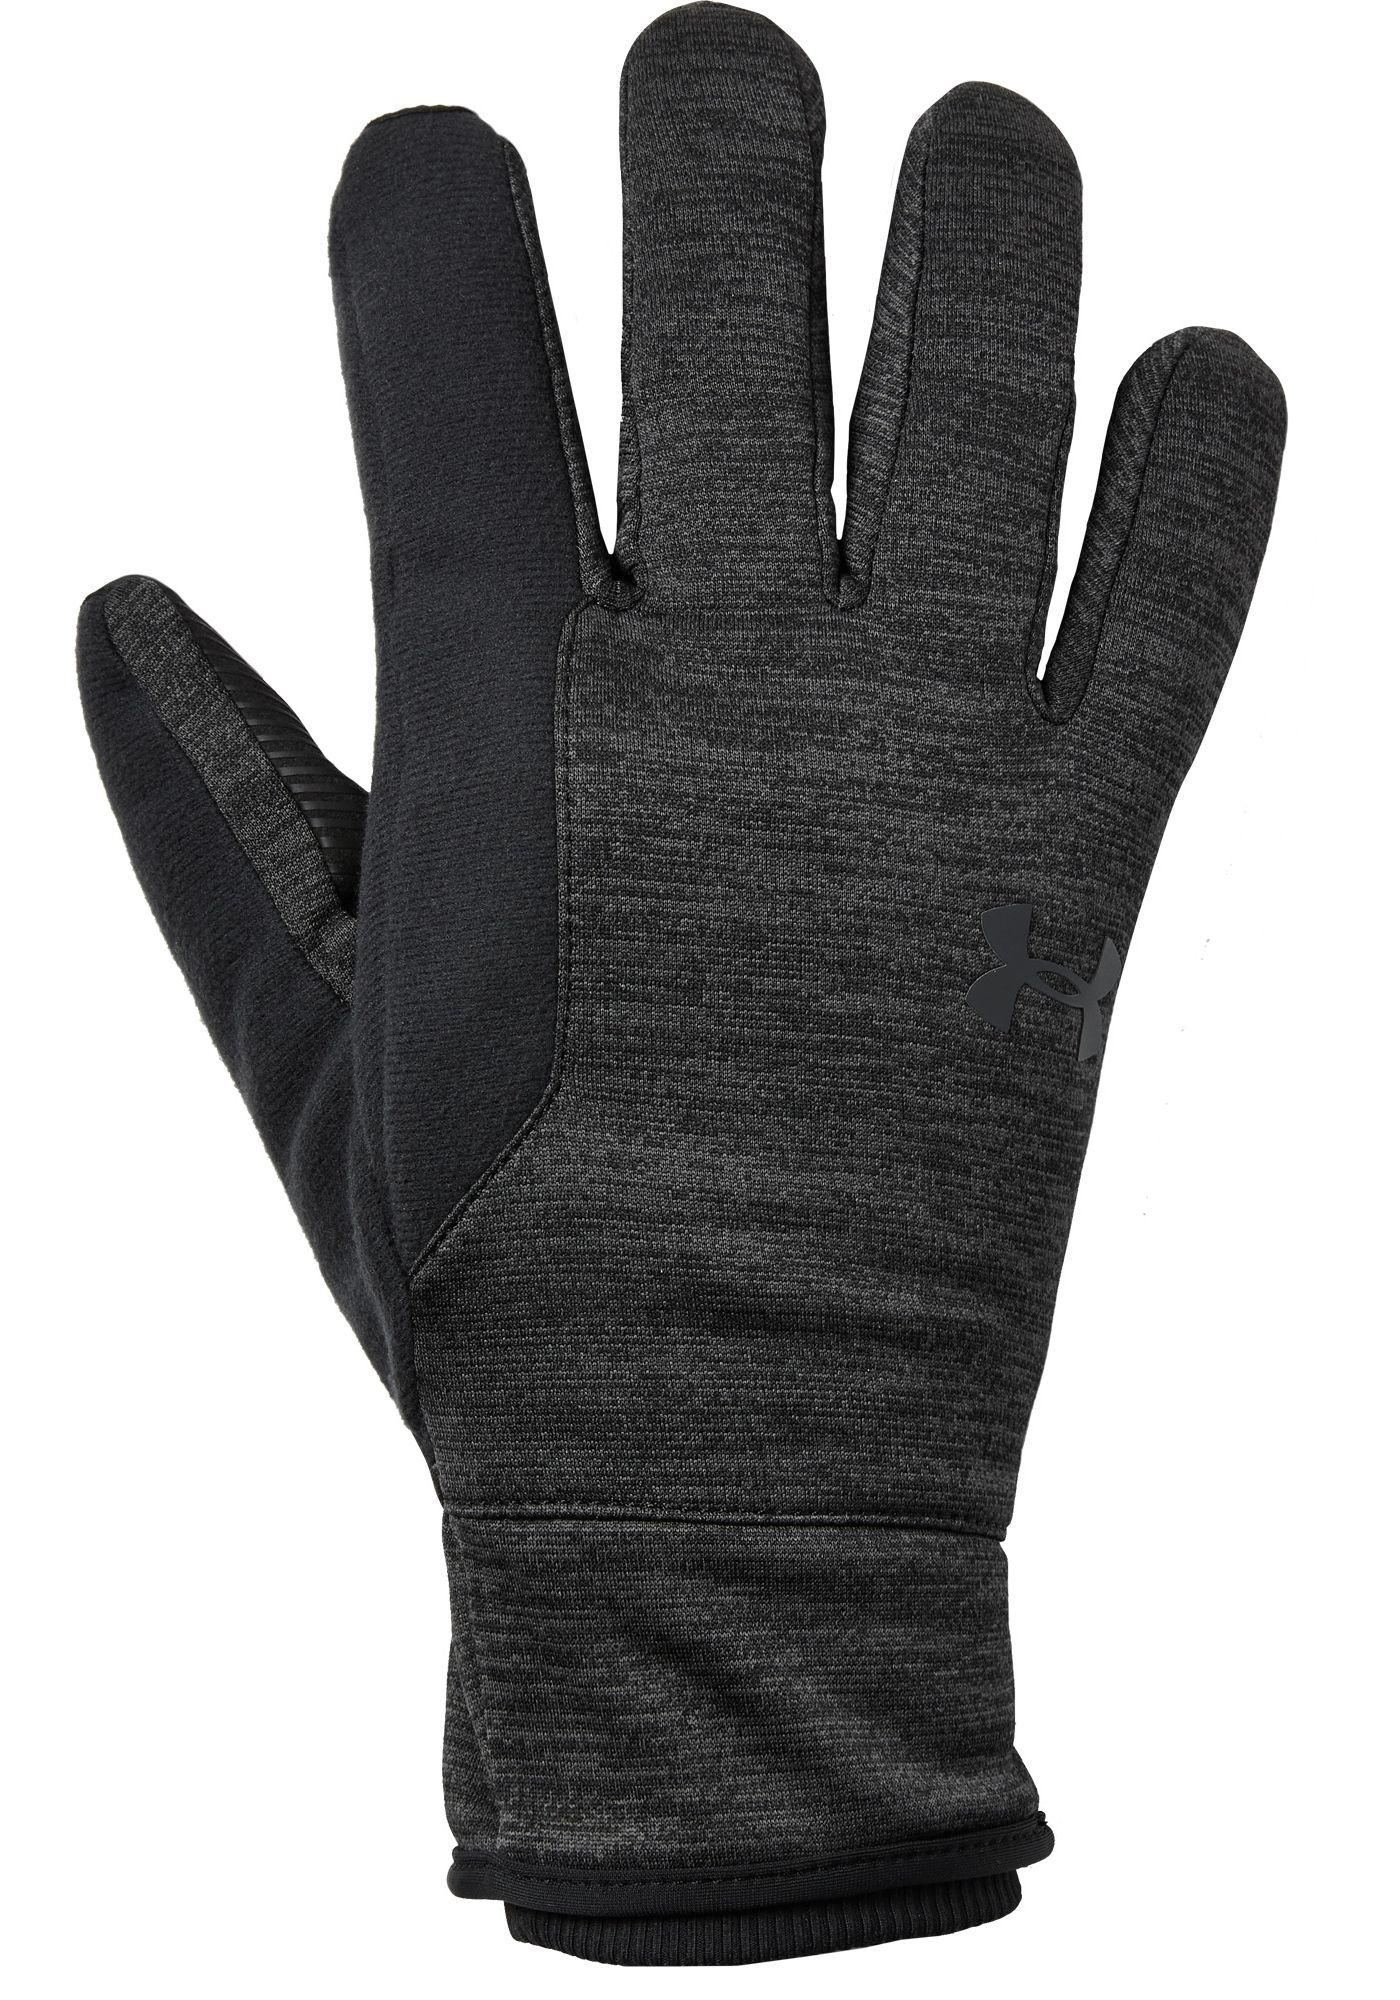 Under Armour Men's ColdGear Infrared Elements Gloves